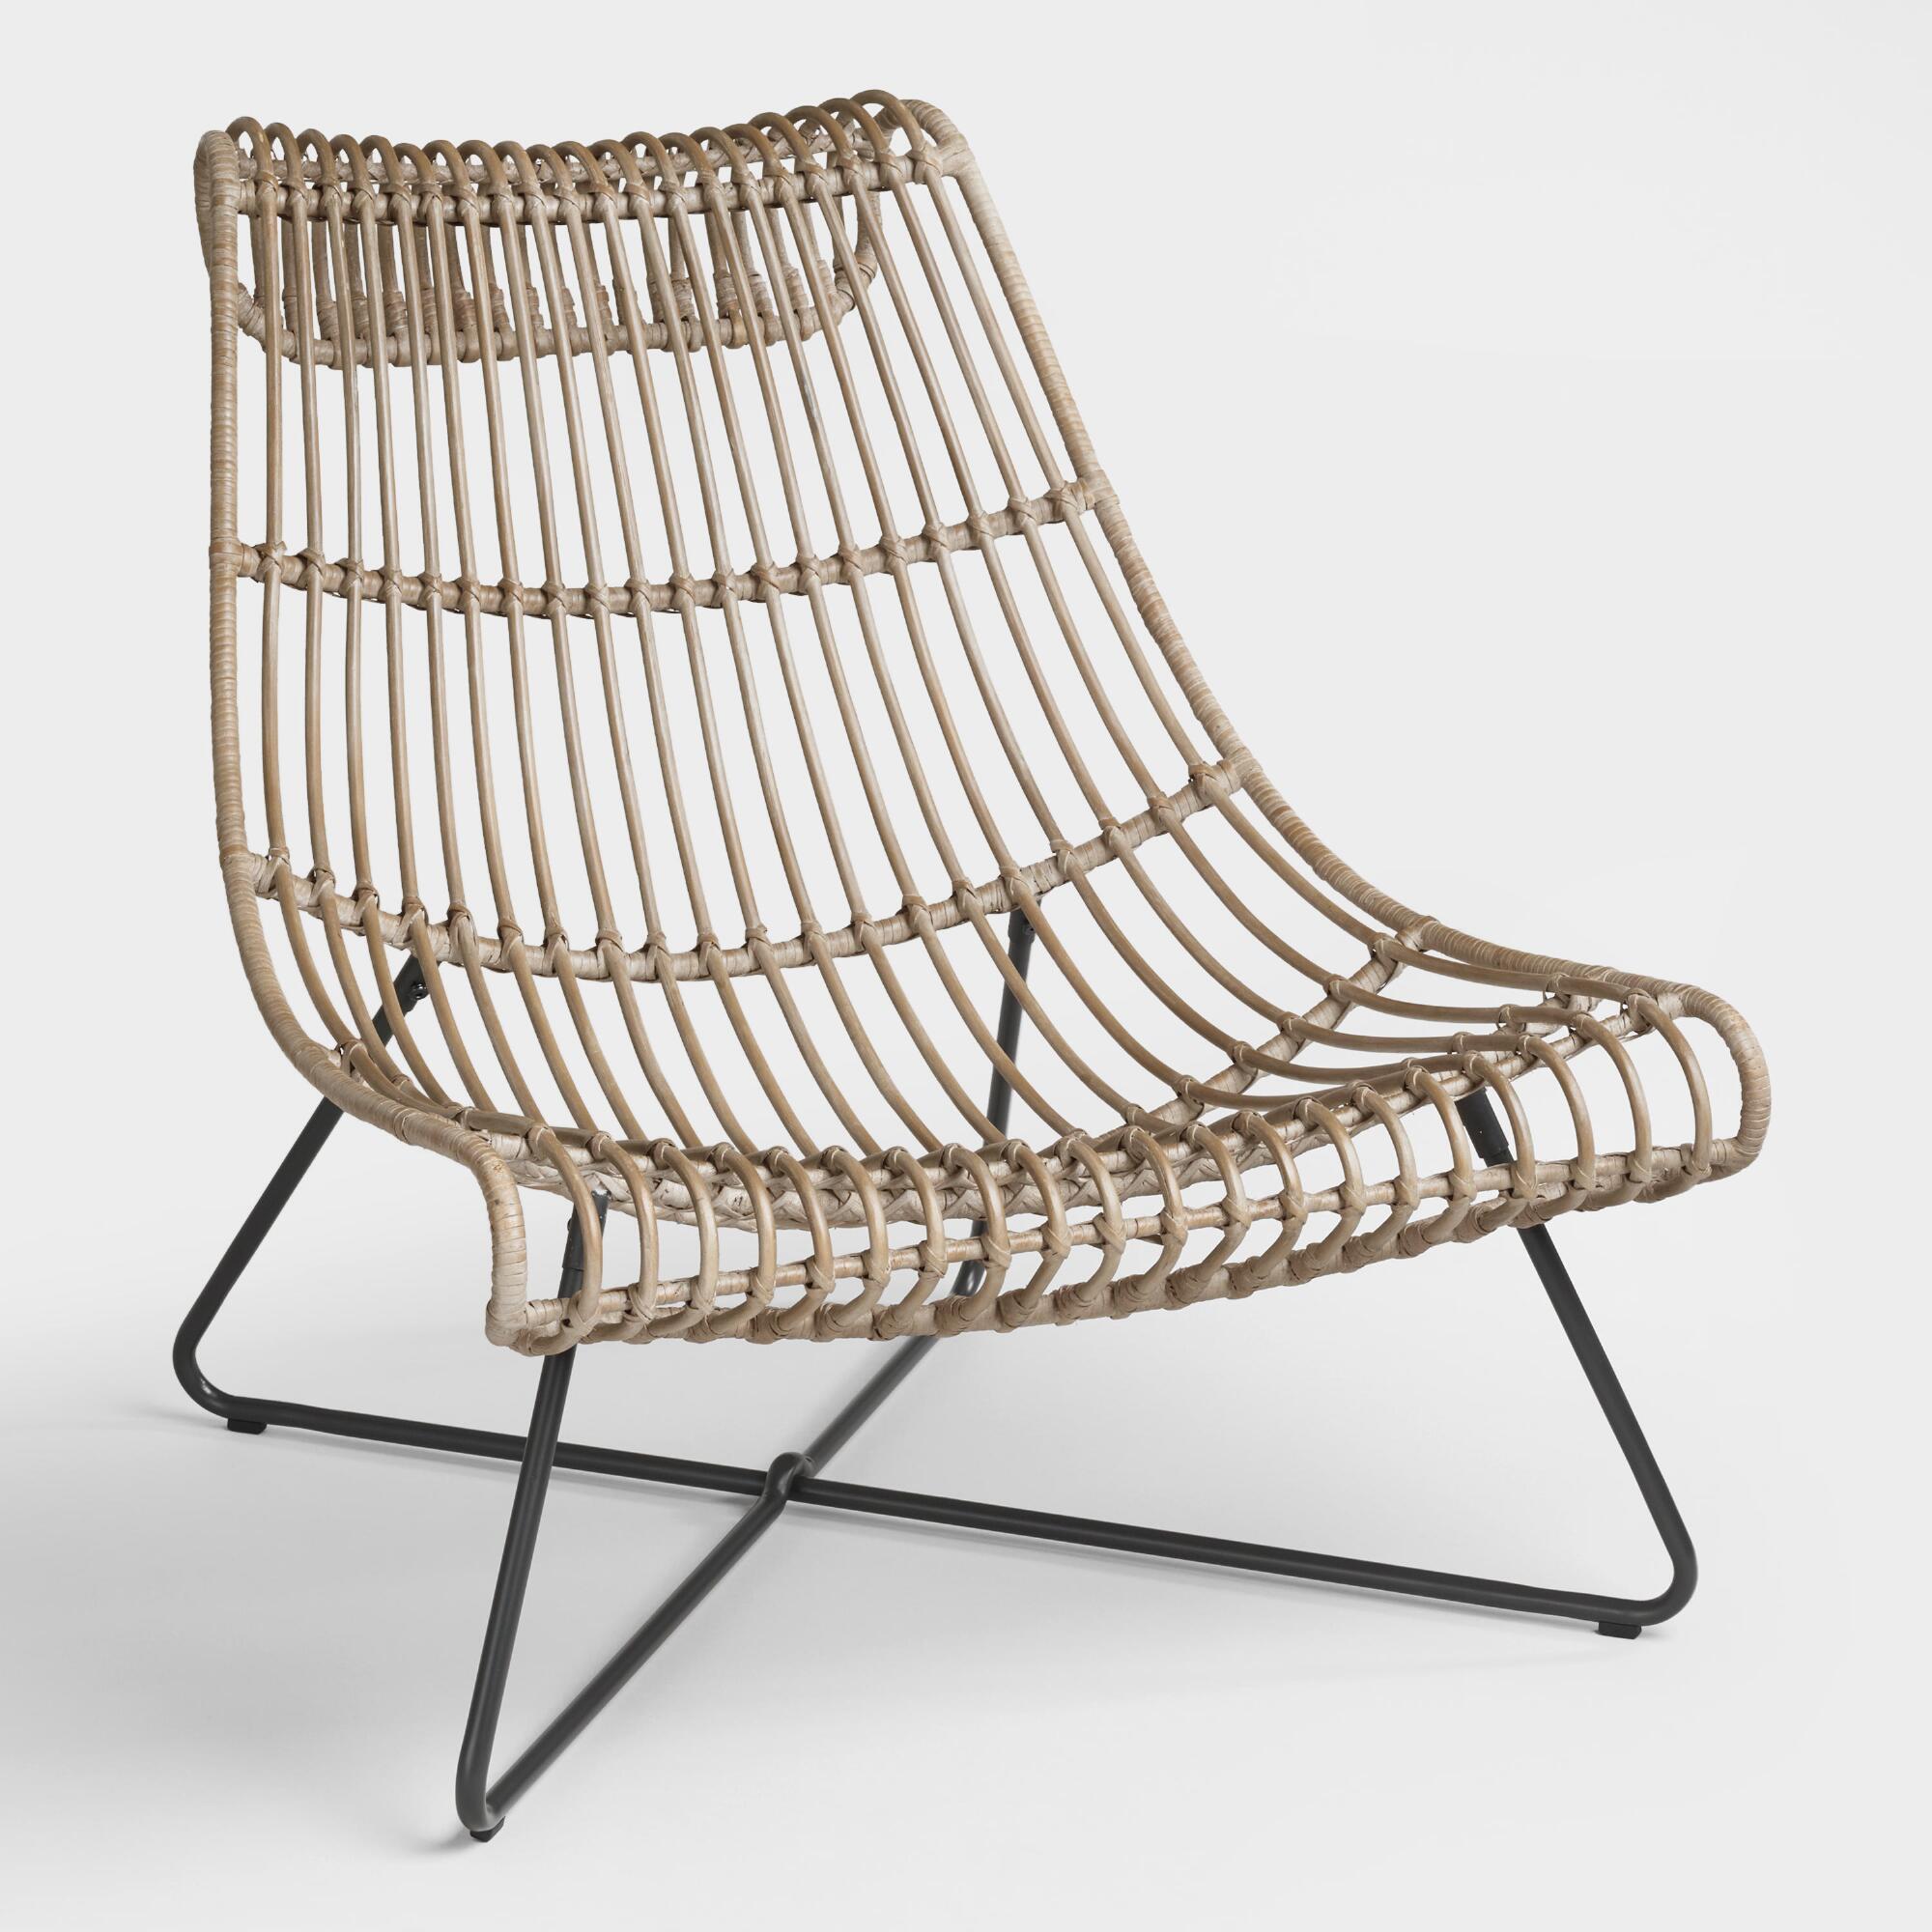 World Market Furniture Reviews: TAUPE RATTAN FLYNN LOUNGER CHAIR